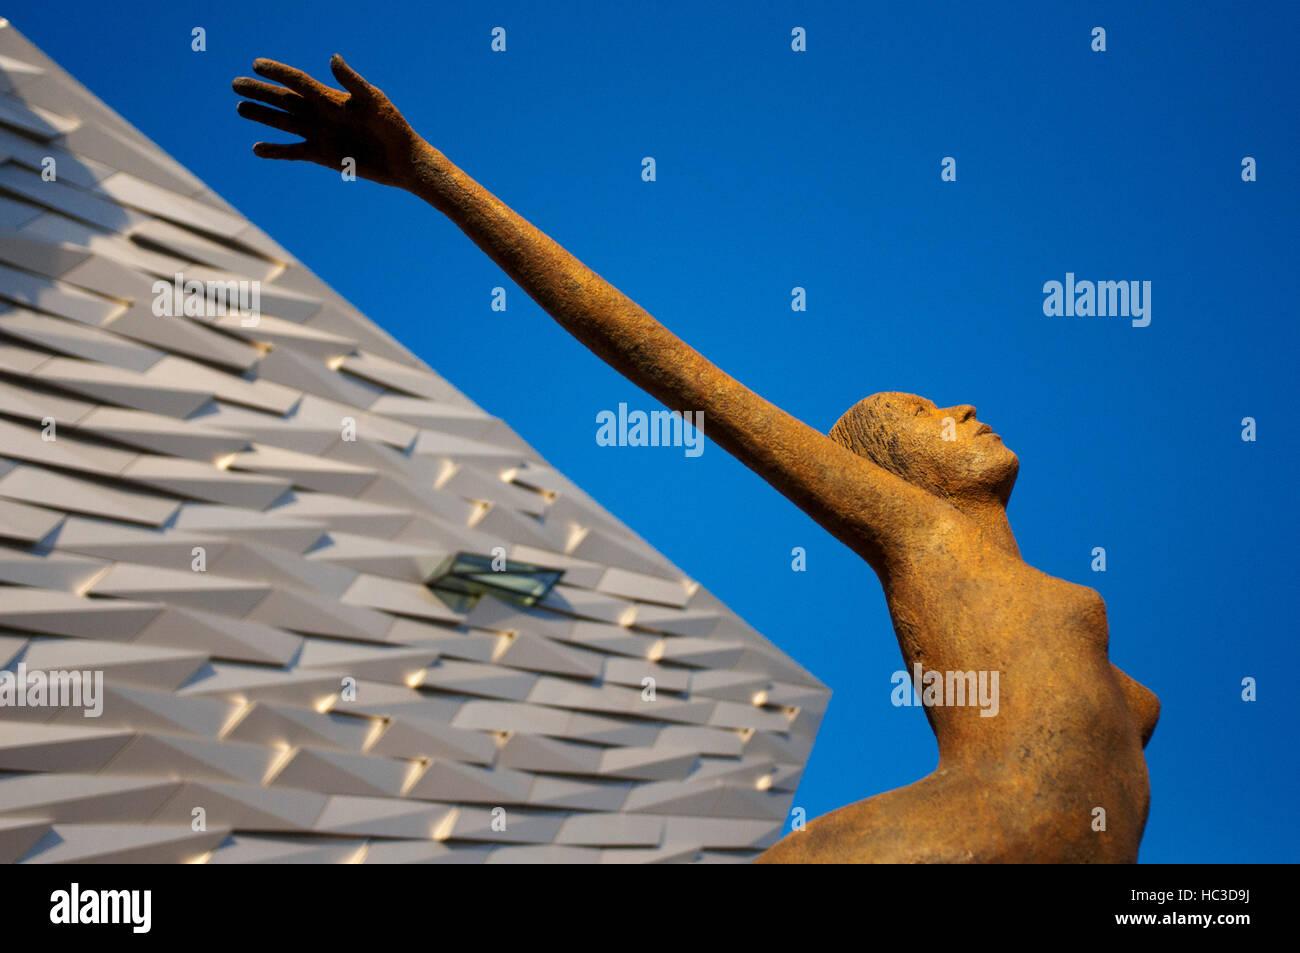 Rowan Gillespie's sculpture Titanica in front of the Titanic museum in Belfast, Northern Ireland United Kingdom Stock Photo